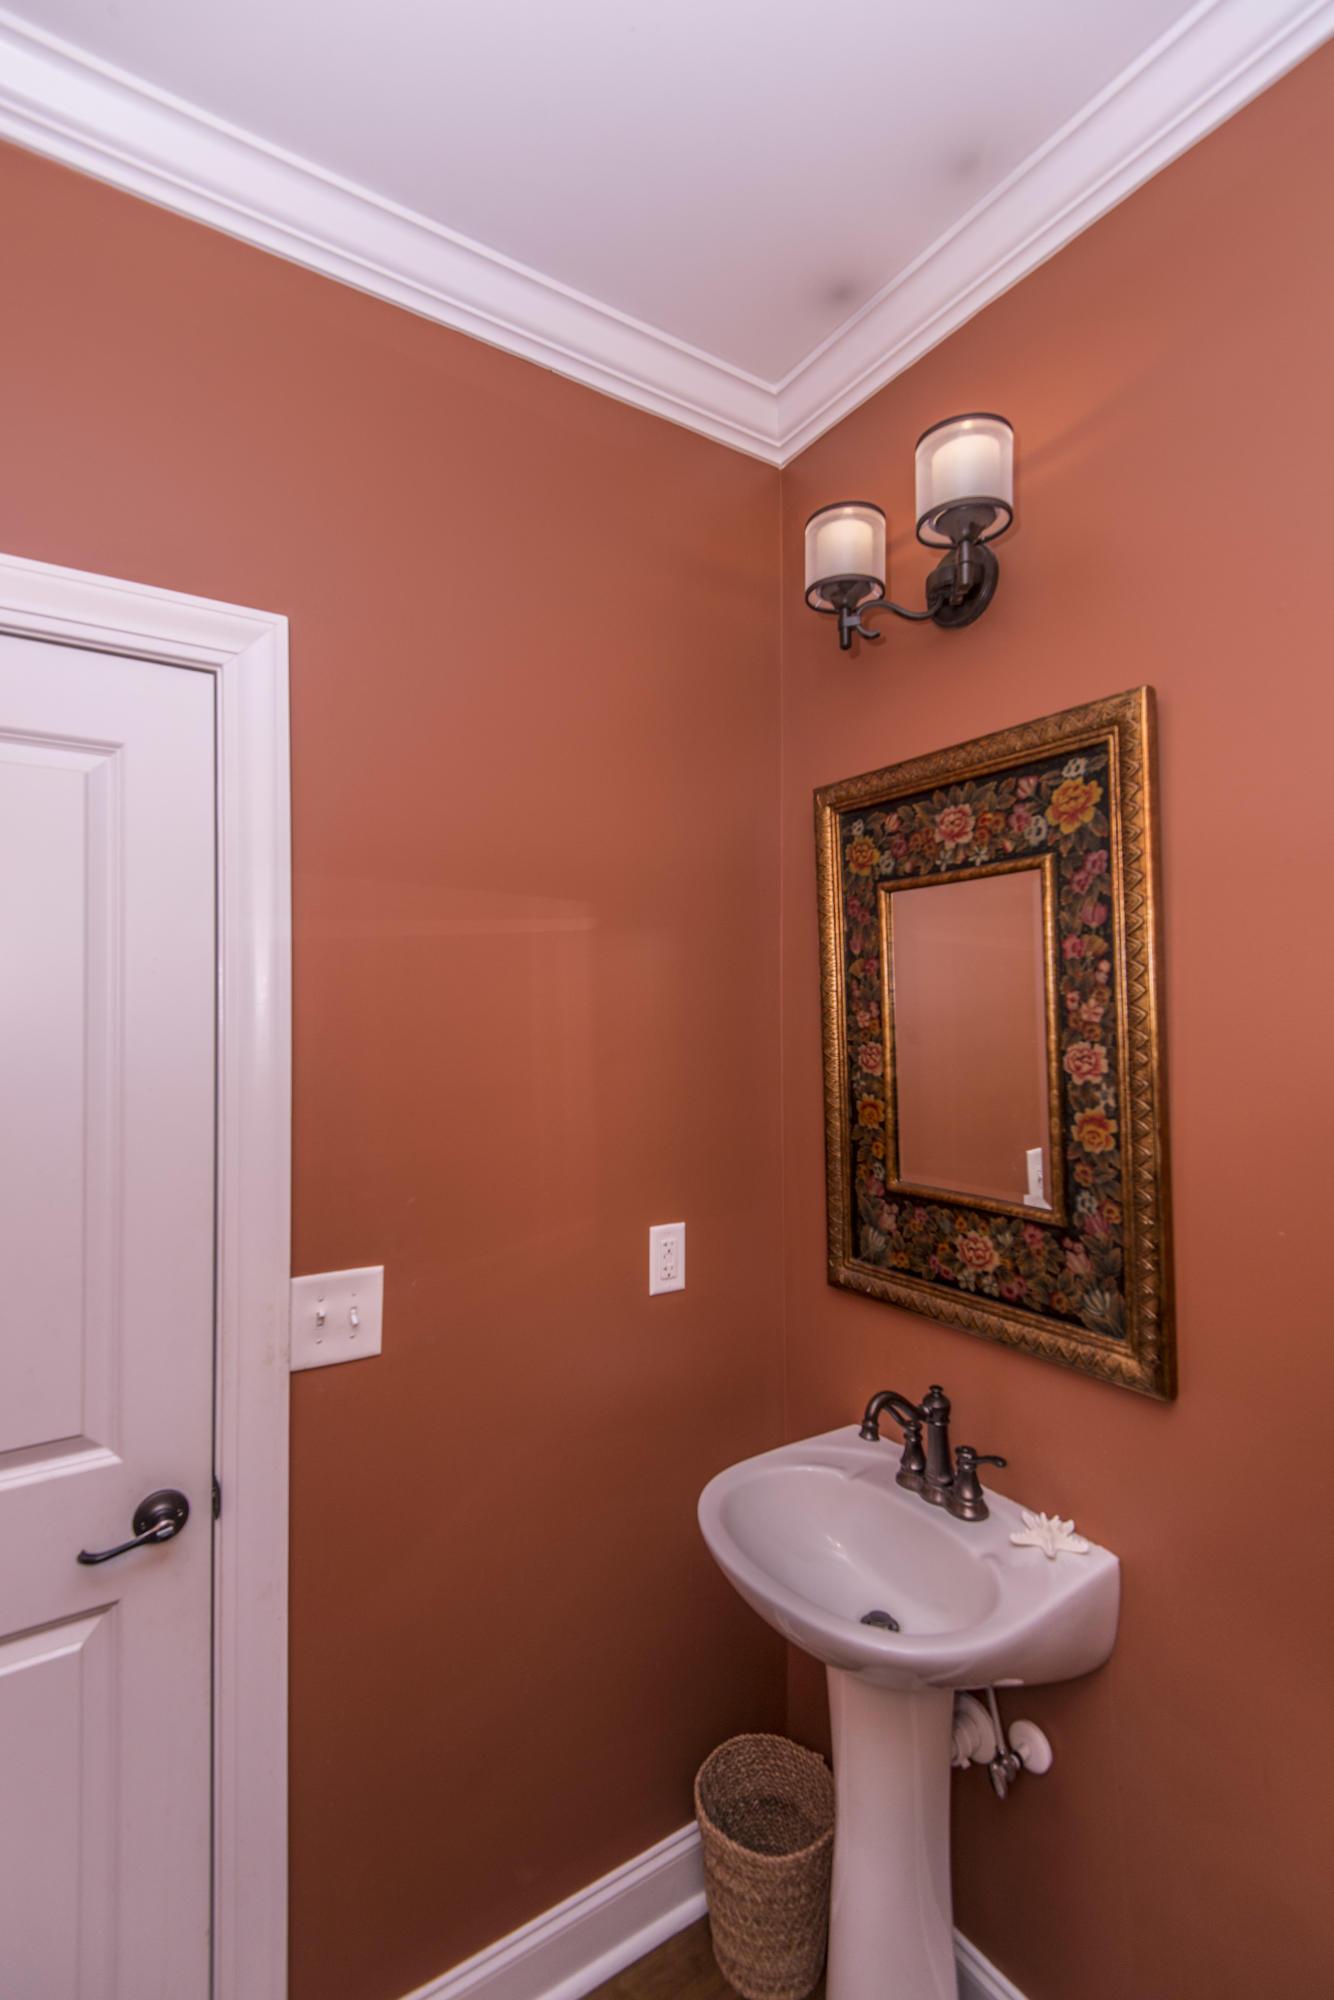 Masonborough Homes For Sale - 1584 Capel, Mount Pleasant, SC - 18